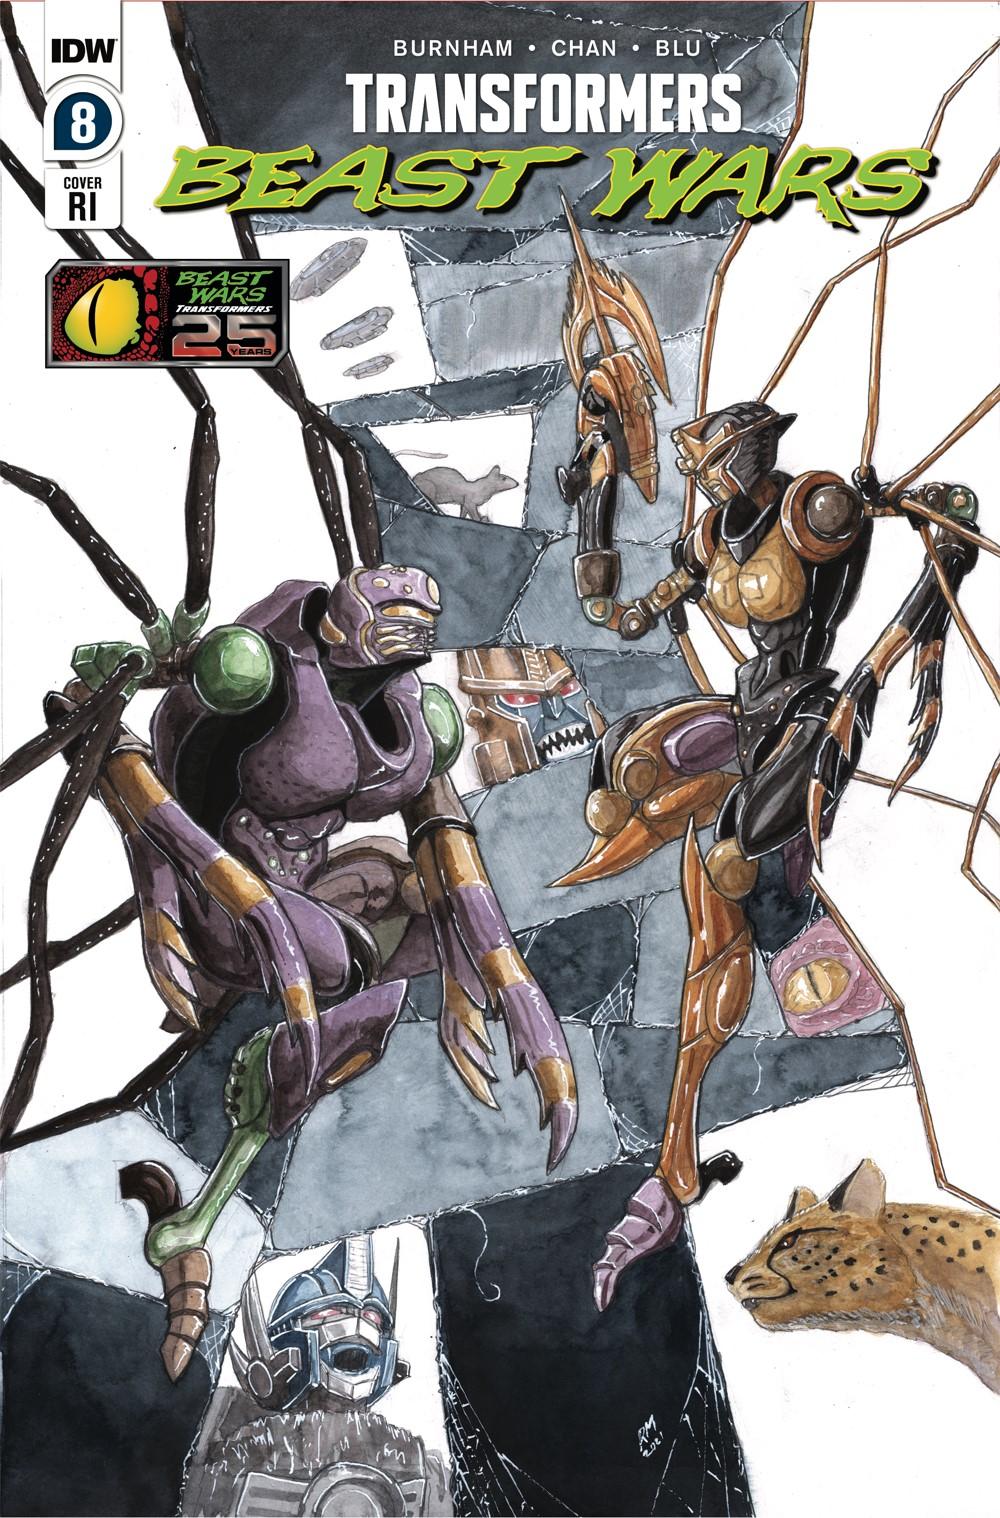 TFBW08-CvrRI ComicList: IDW Publishing New Releases for 09/22/2021